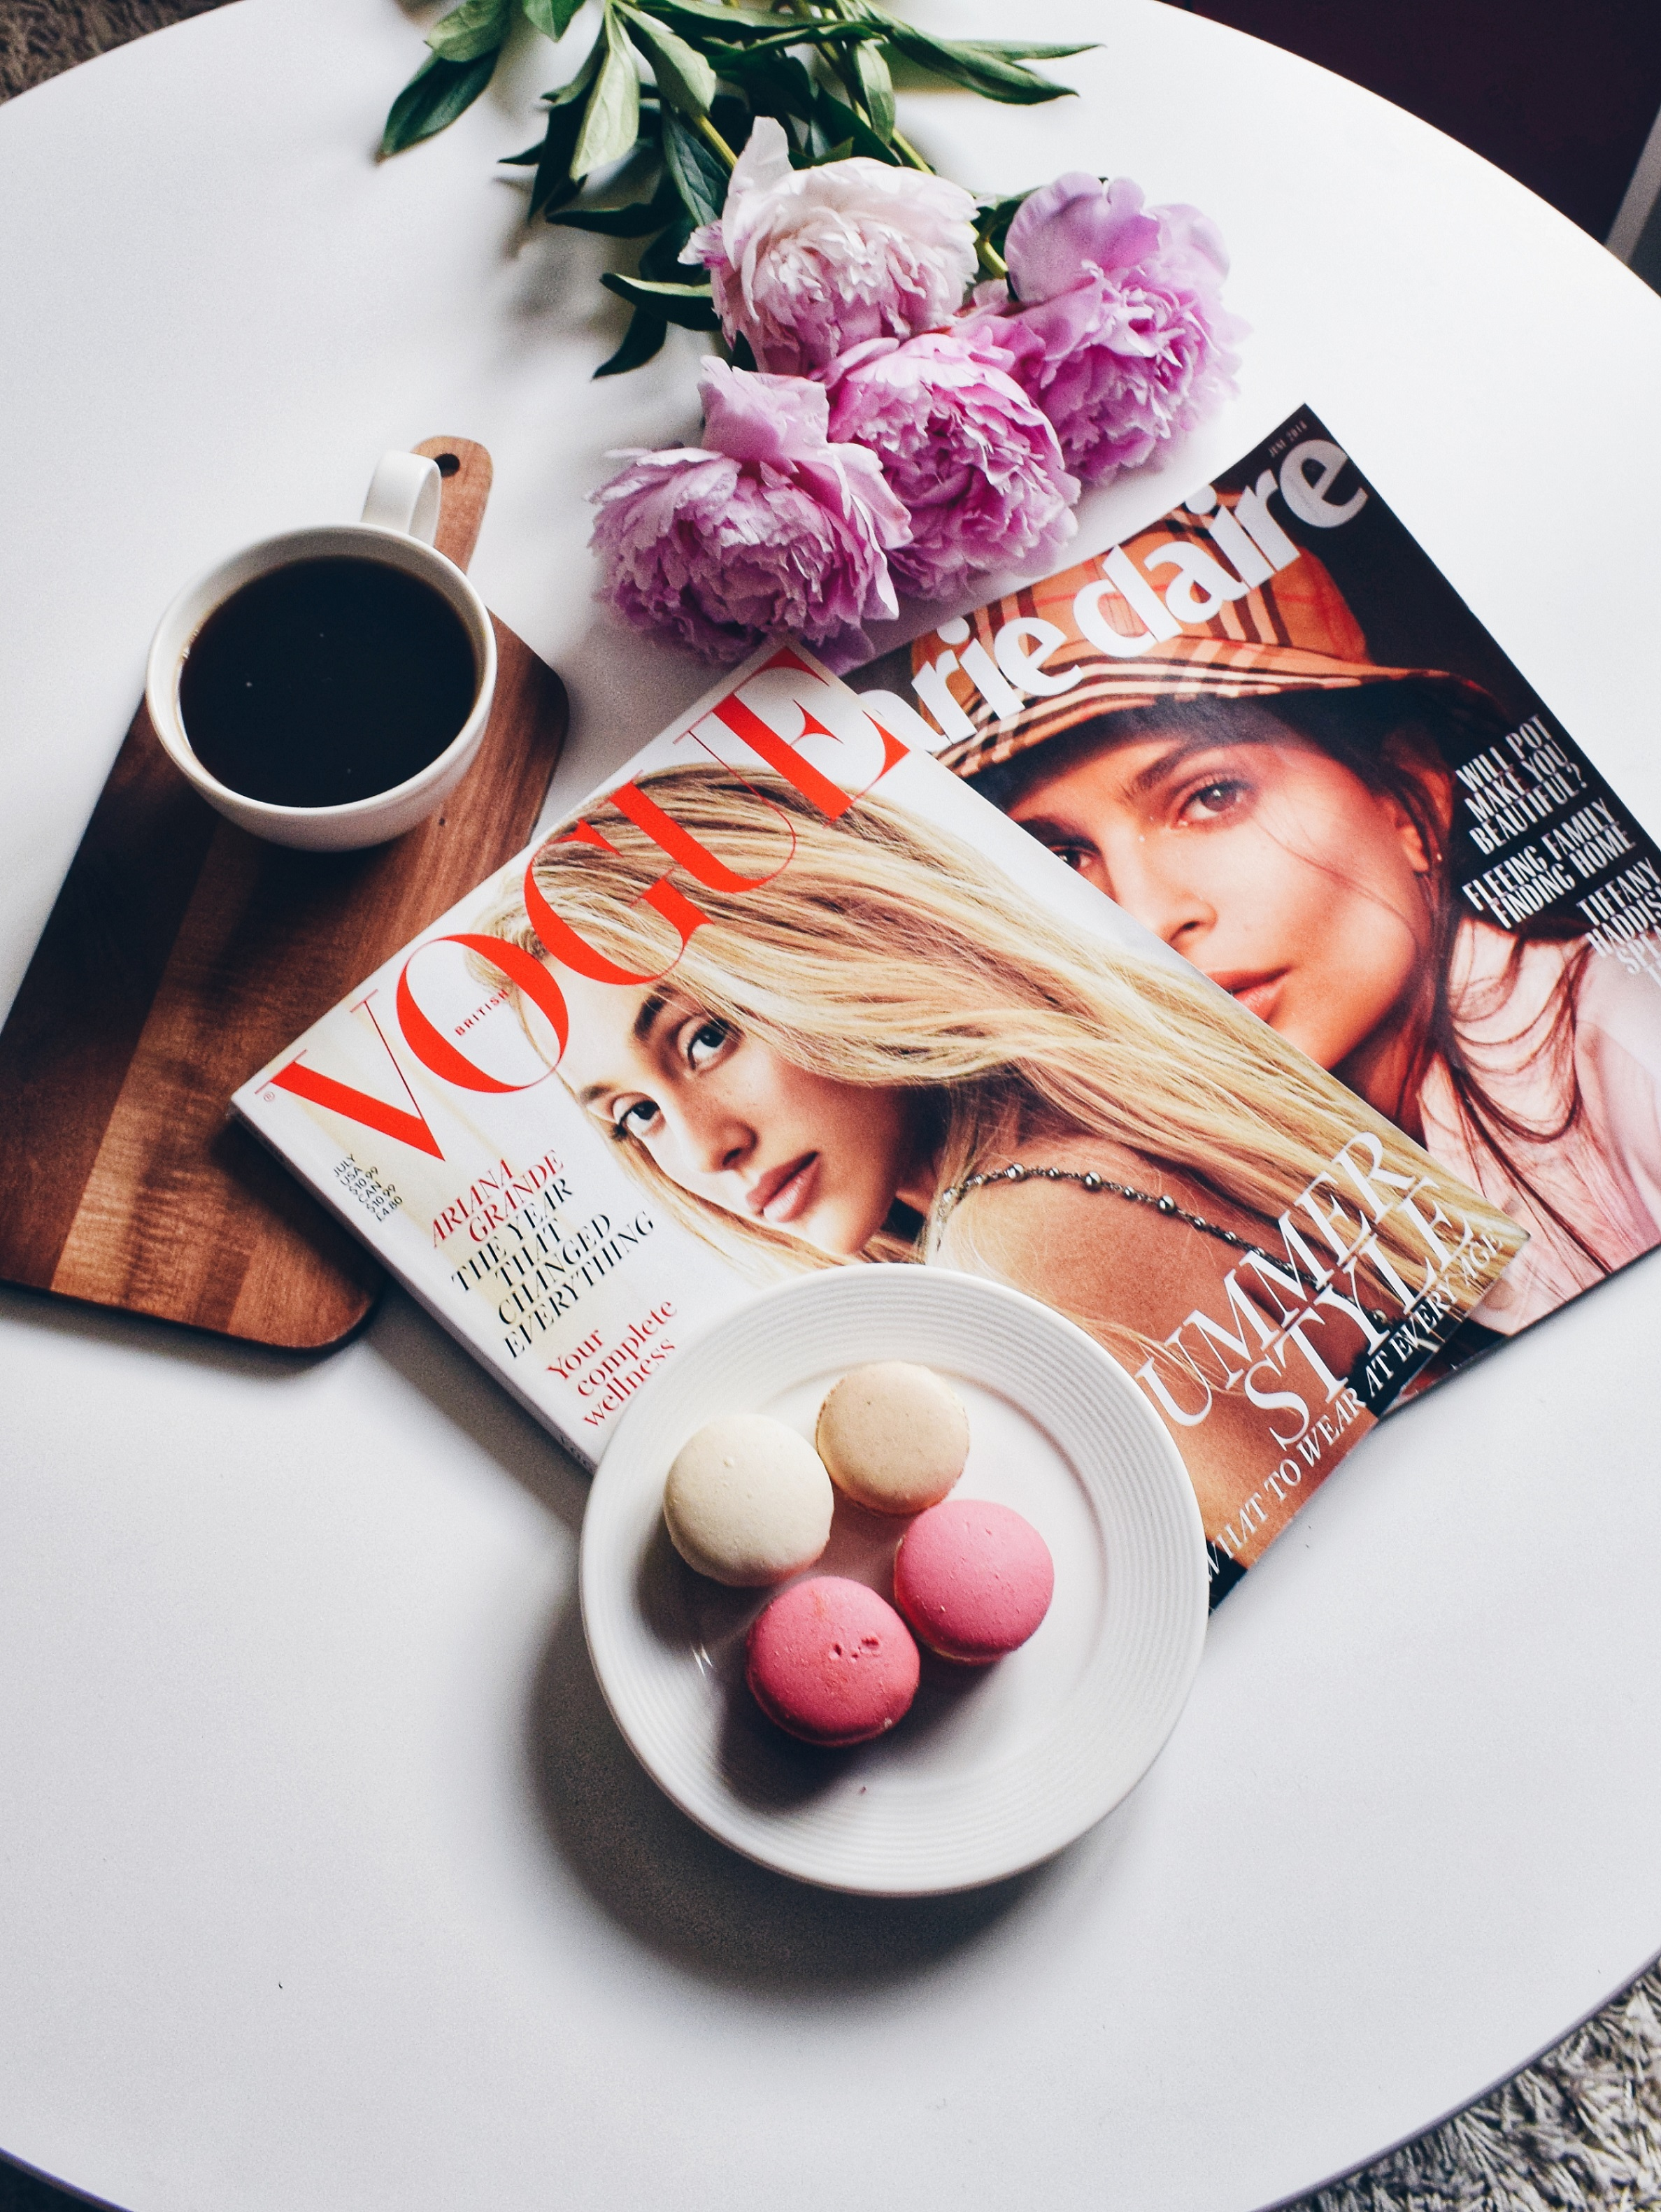 Outlandish blog unplug summer vacation holiday relax vogue coffee peonies macarons